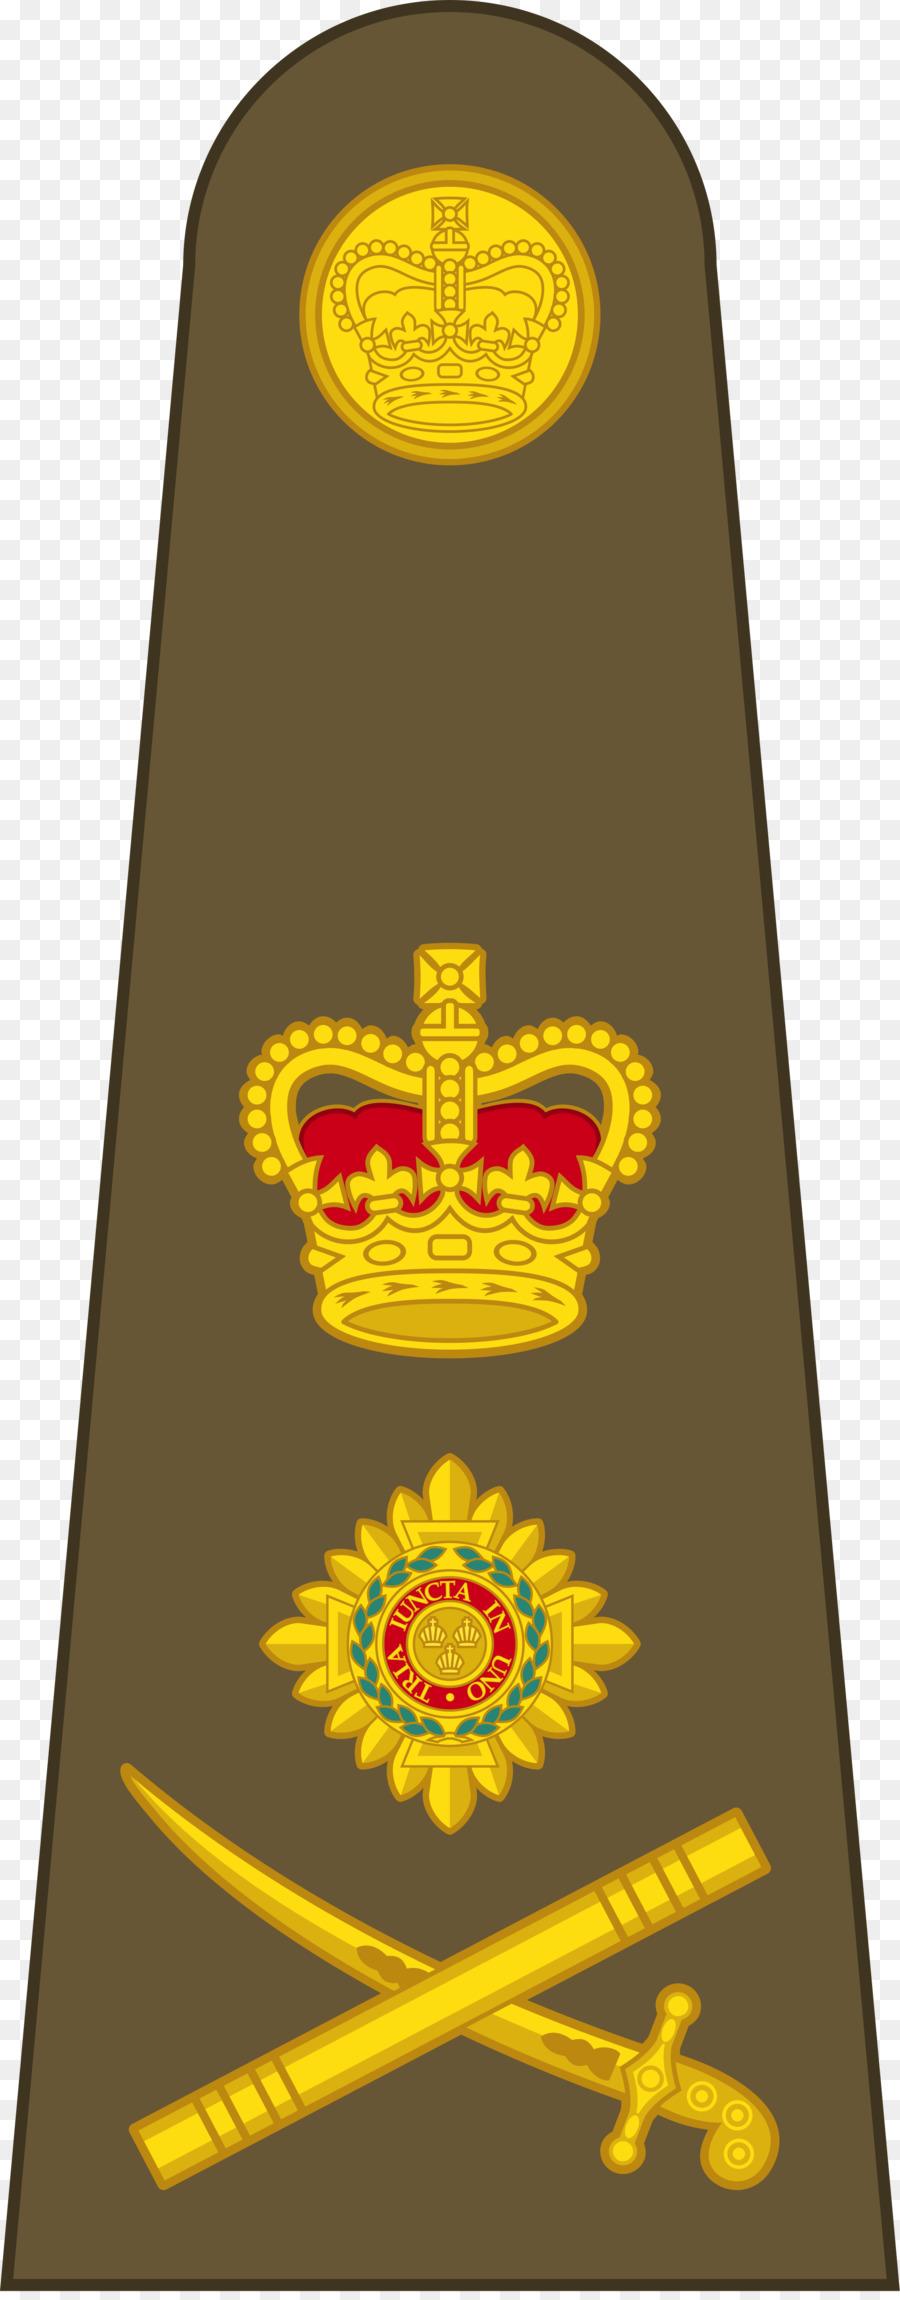 British Army Officer Rank Insignia Military Rank Colonel British